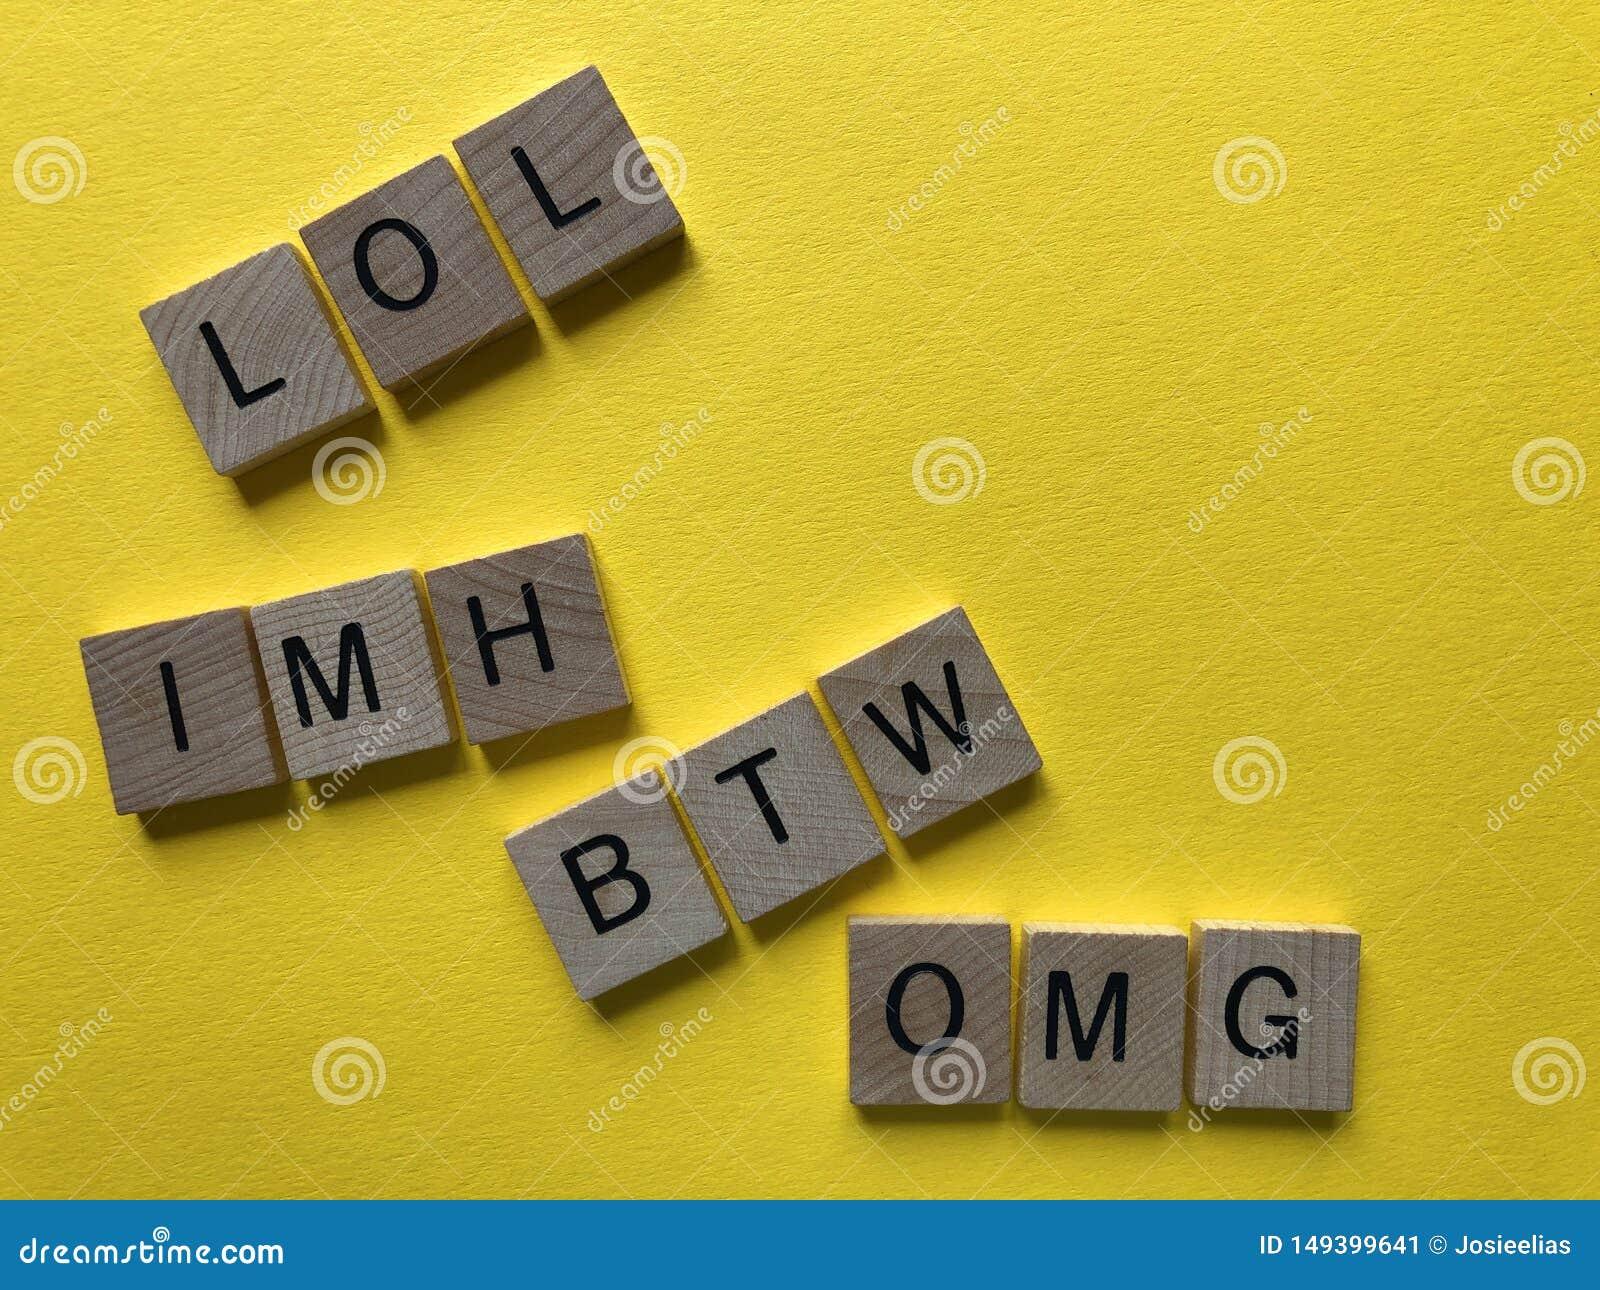 10 Popular Internet Slang Terms Decoded For Middle-Age ... |Internet Slang Btw Meaning